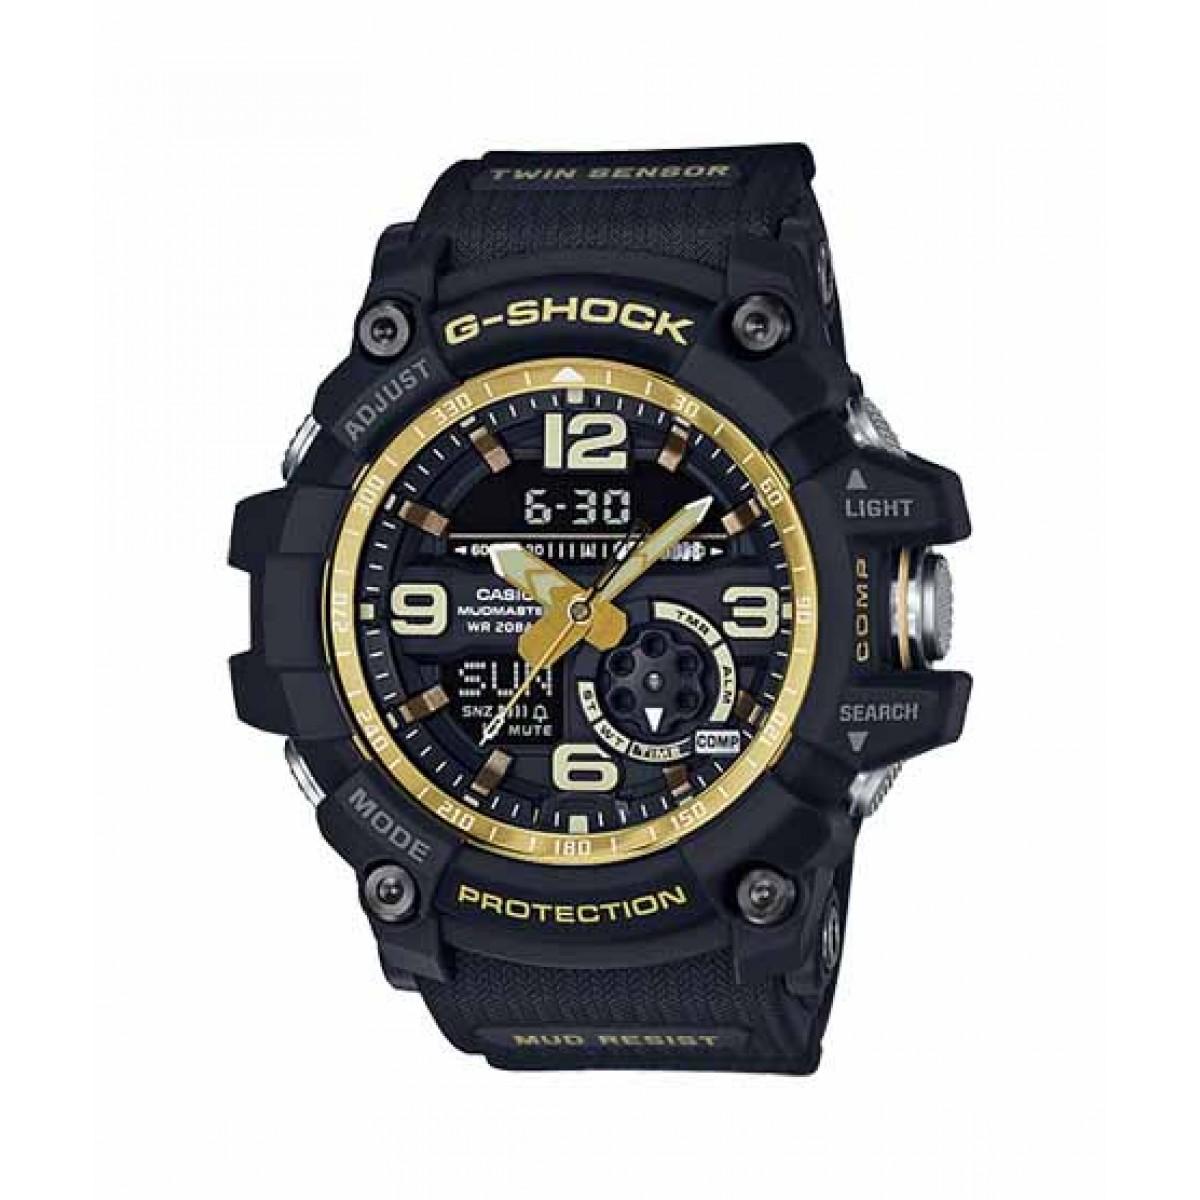 Casio G-Shock Men's Watch (GG1000GB-1A)